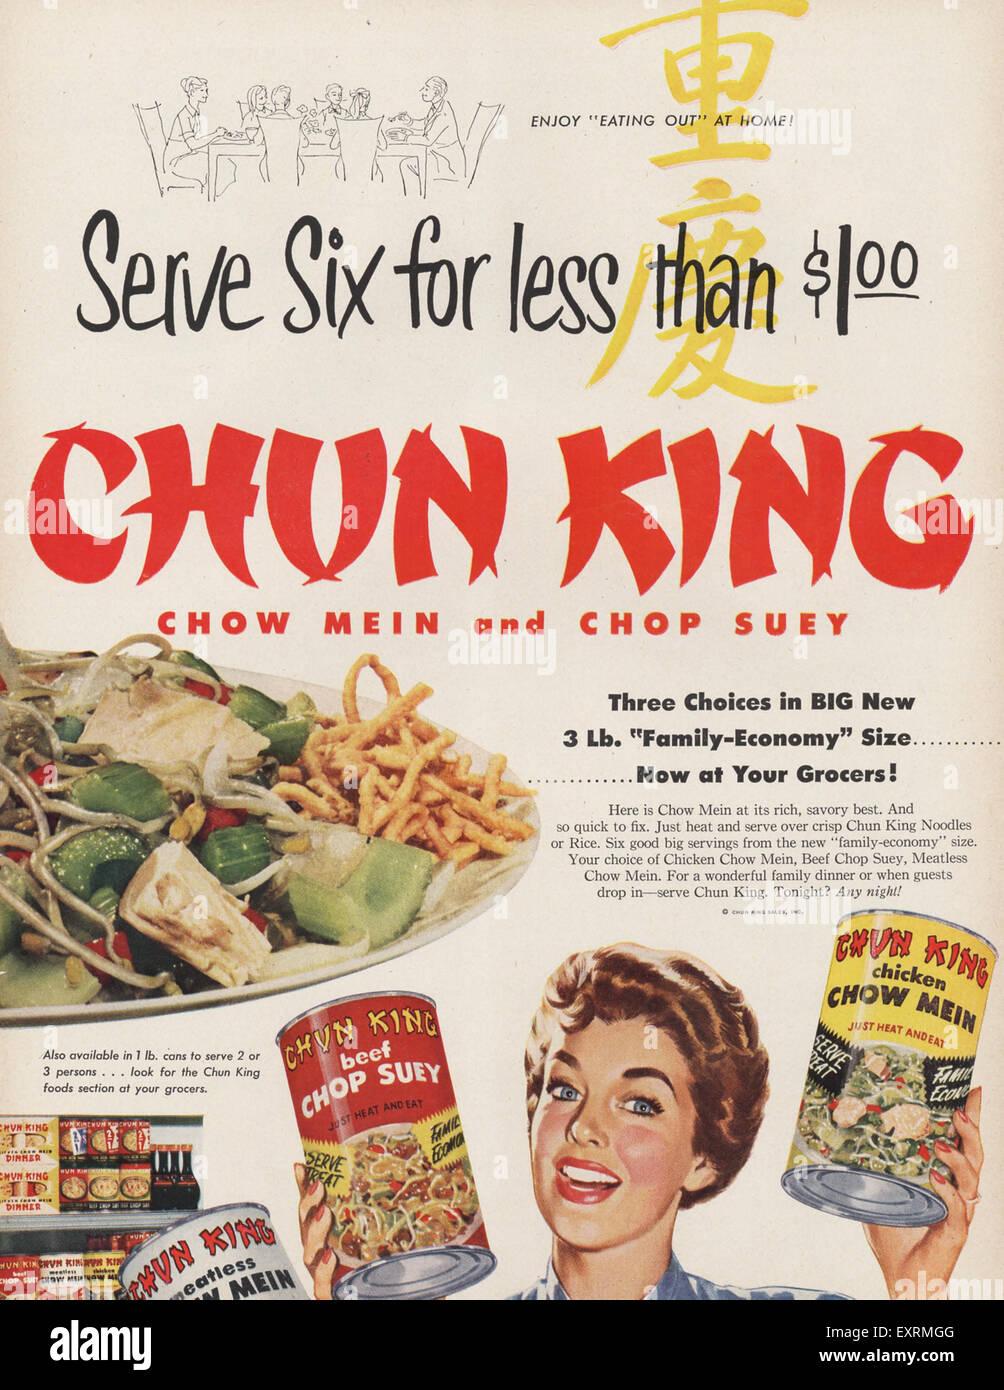 Chun King Magazine Advert - Stock Image